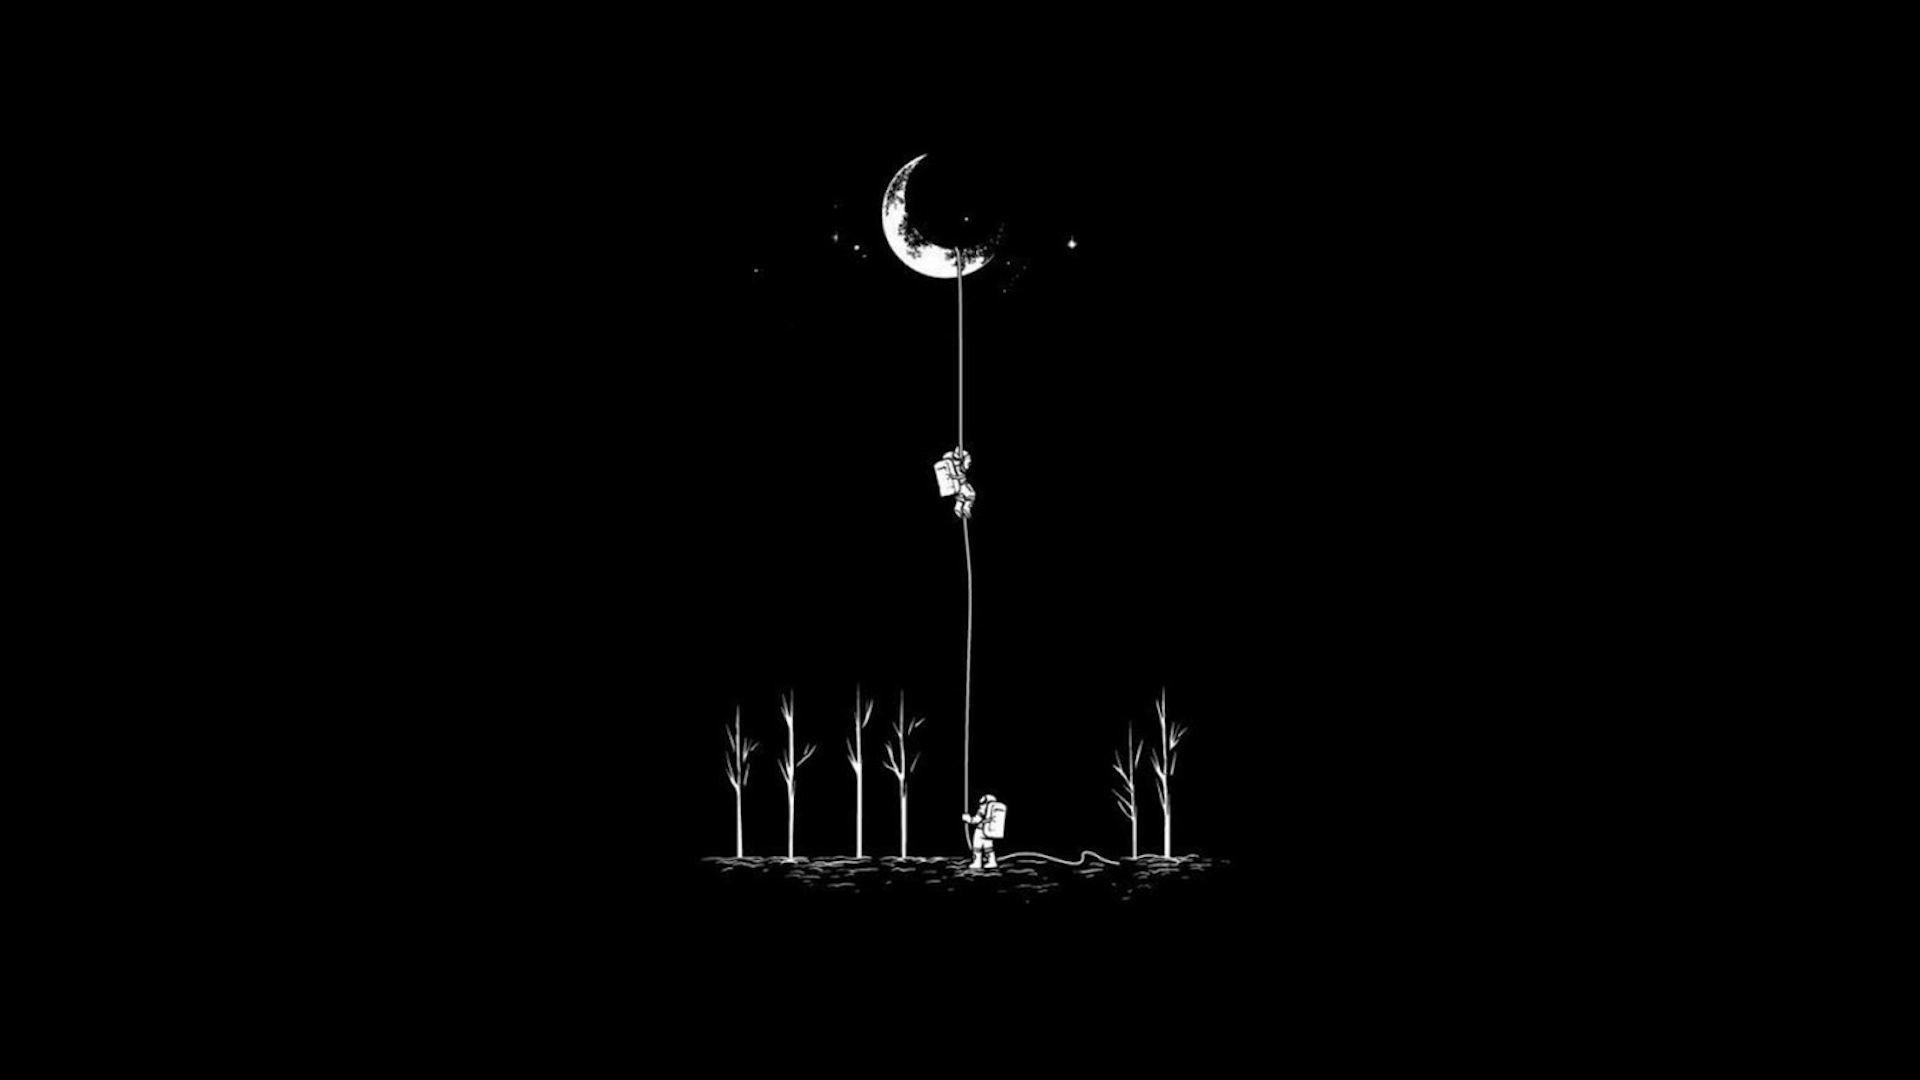 Moon Wallpaper 87 Images